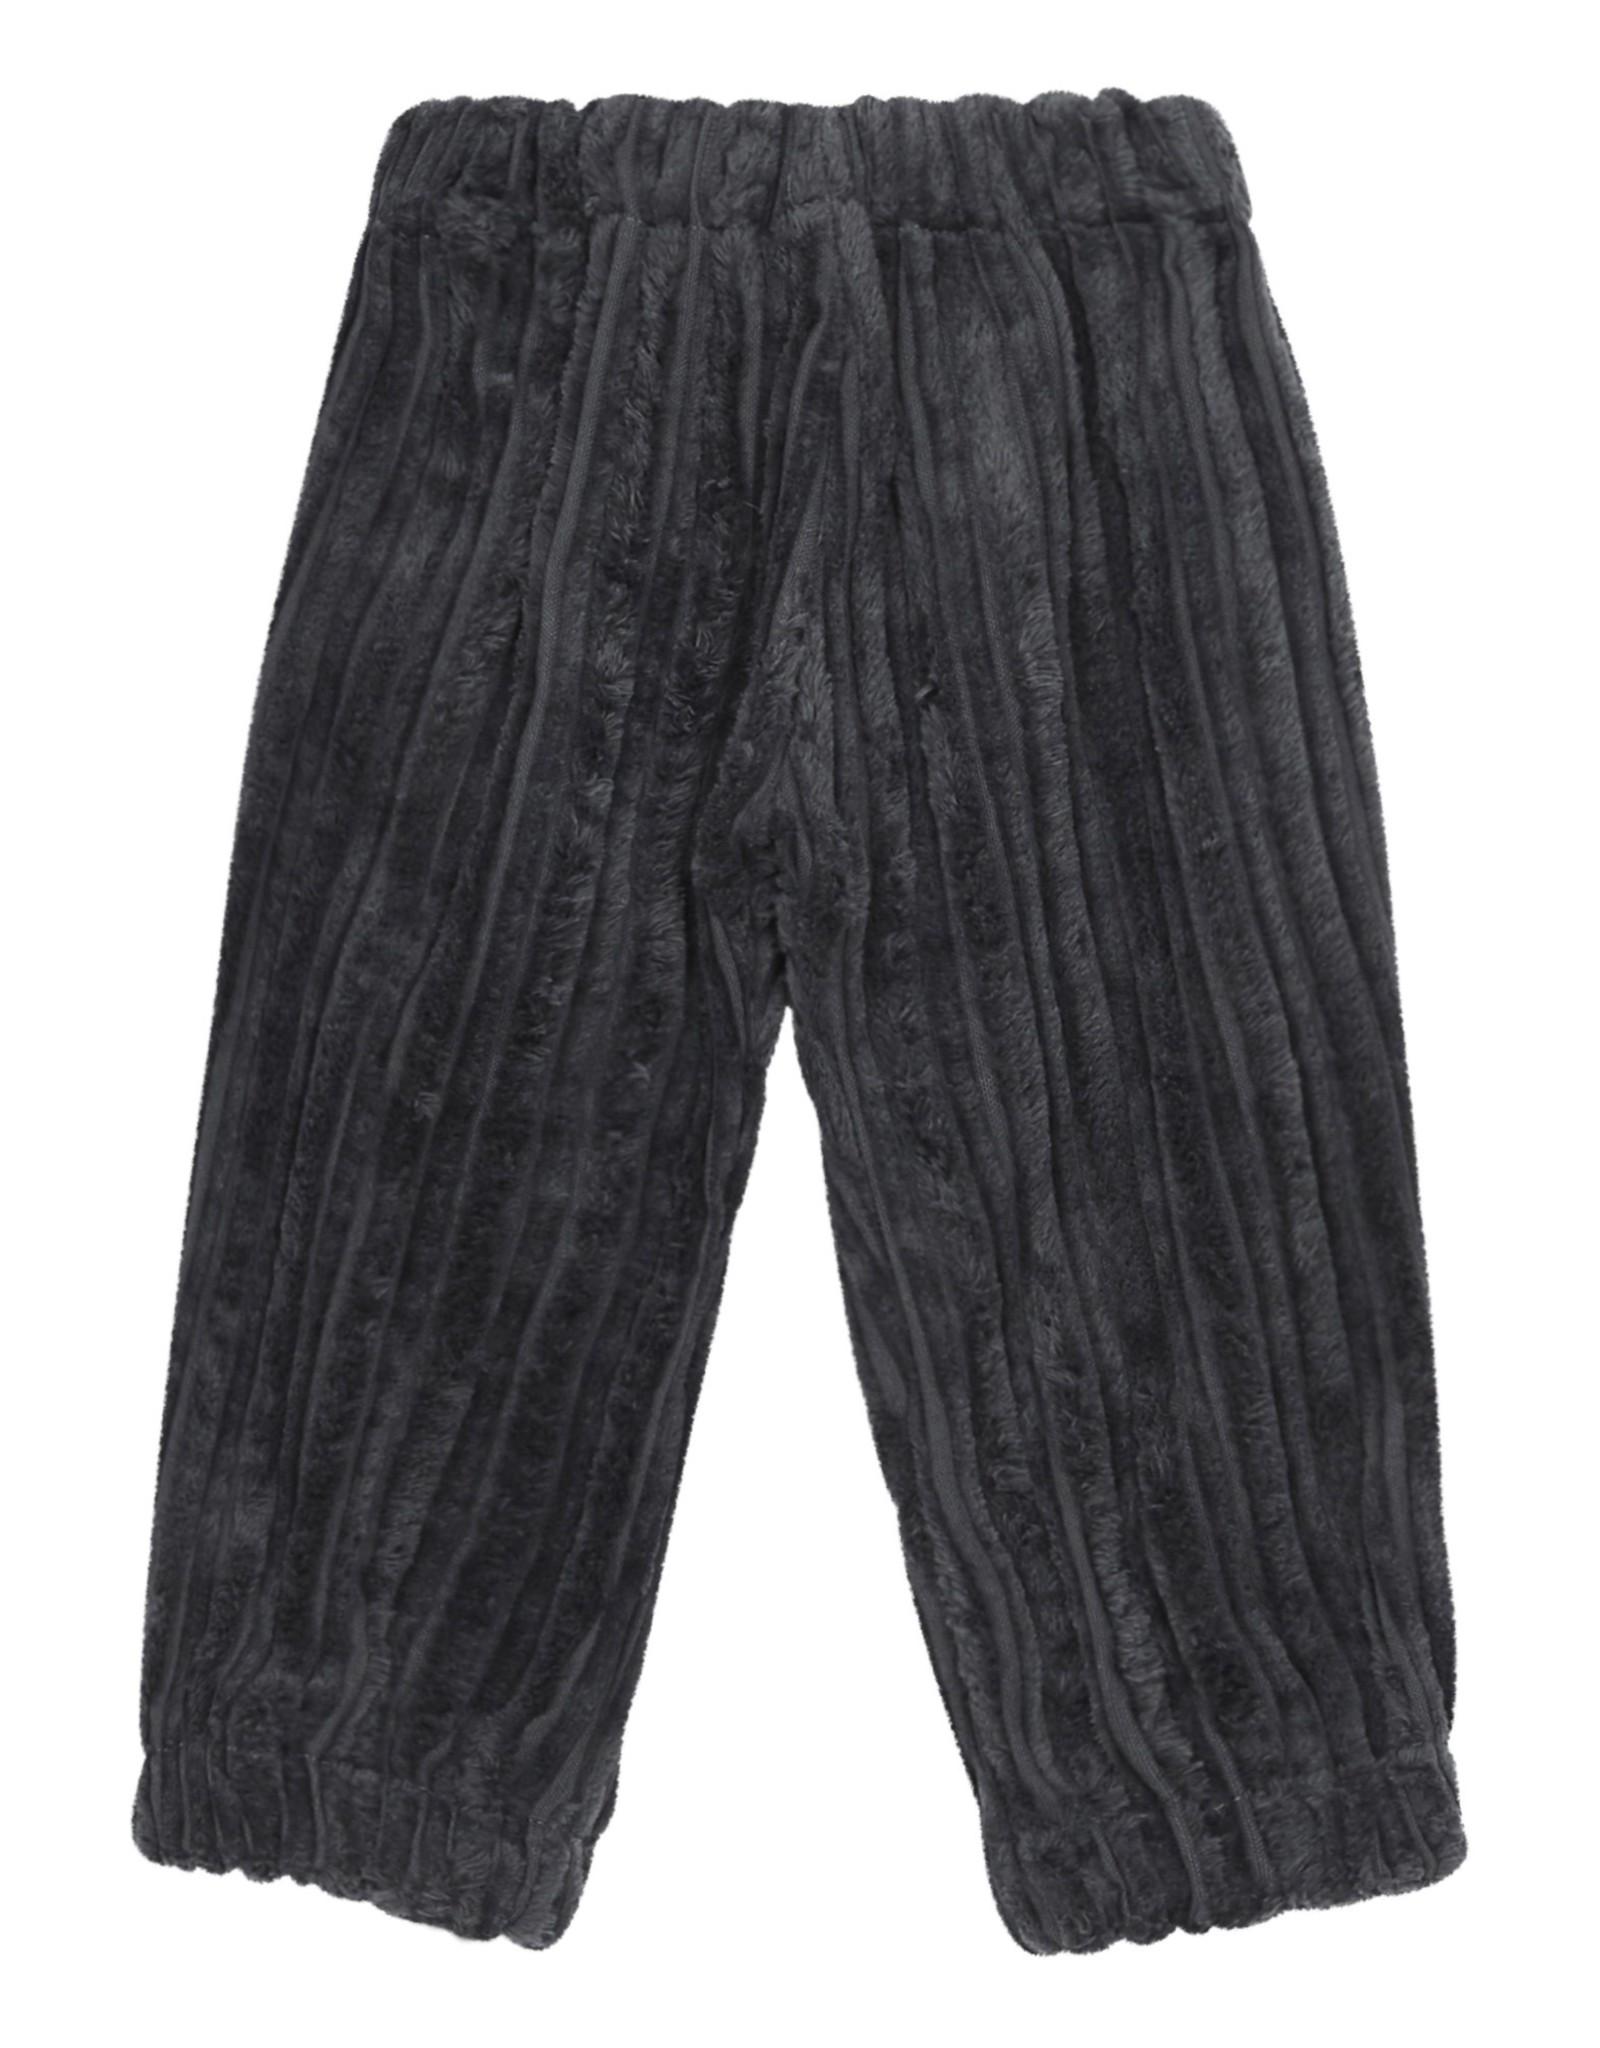 Pequeno Tocon Pantalon Sarouel